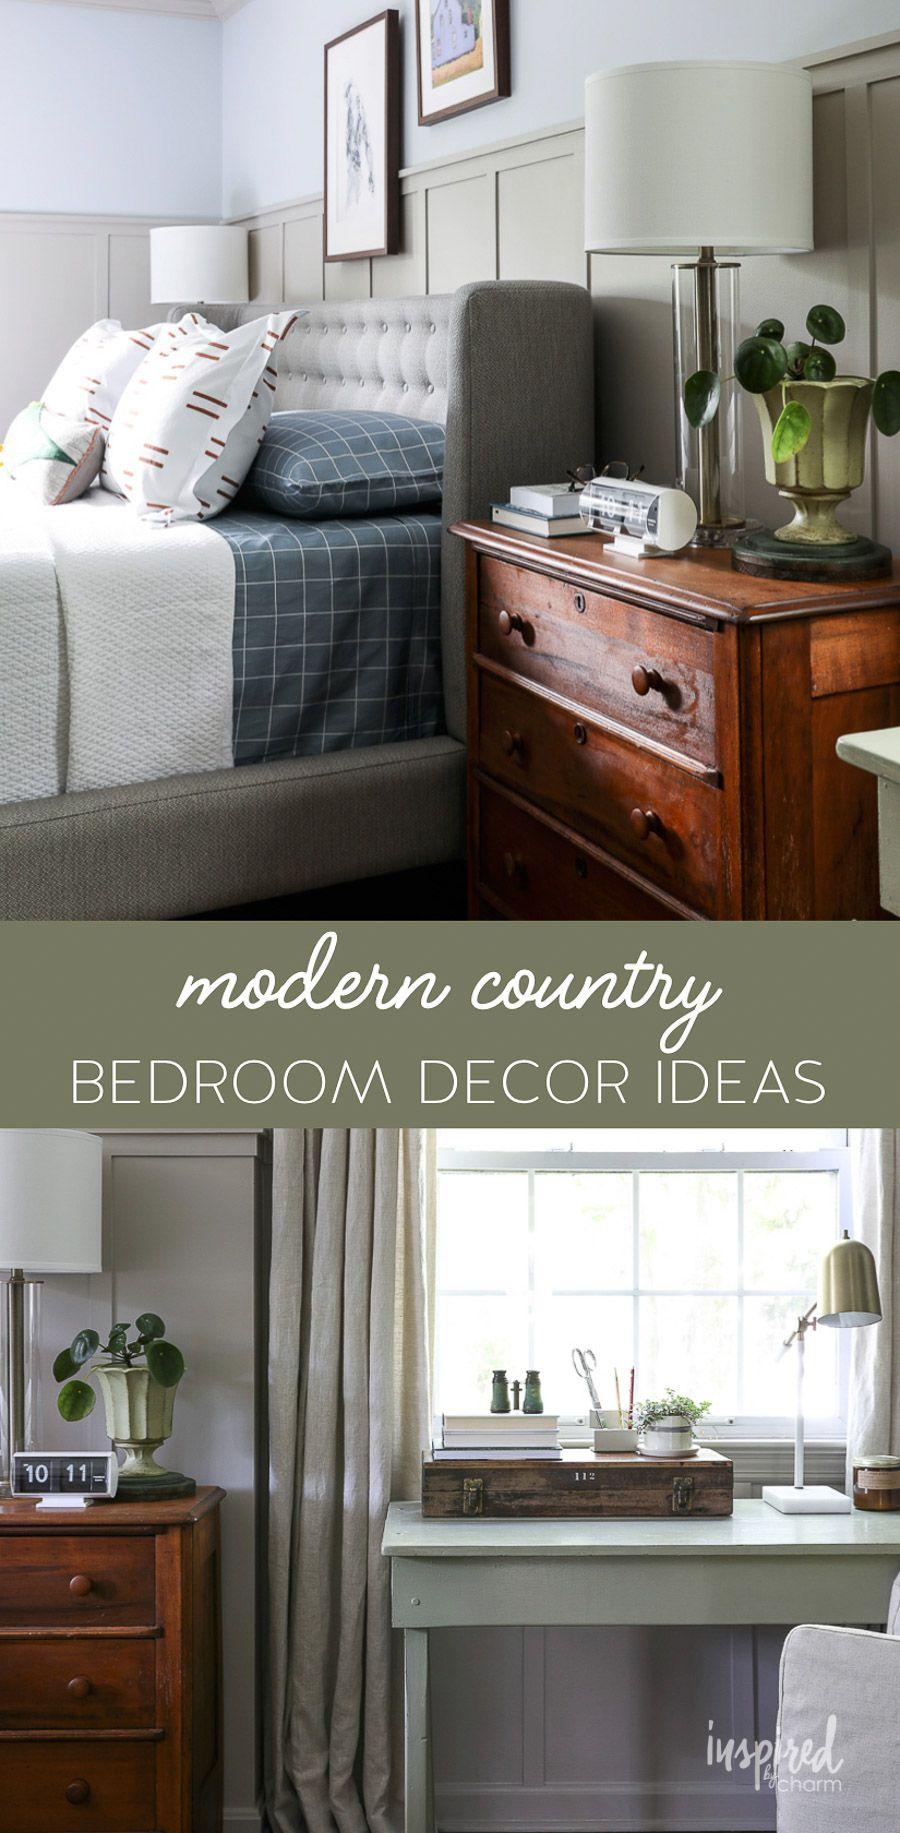 Master Bedroom Makeover Reveal Decor Ideas Decor Masculine Modern Country Bedroom Country Bedroom Decor Modern Country Bedrooms Master Bedroom Makeover